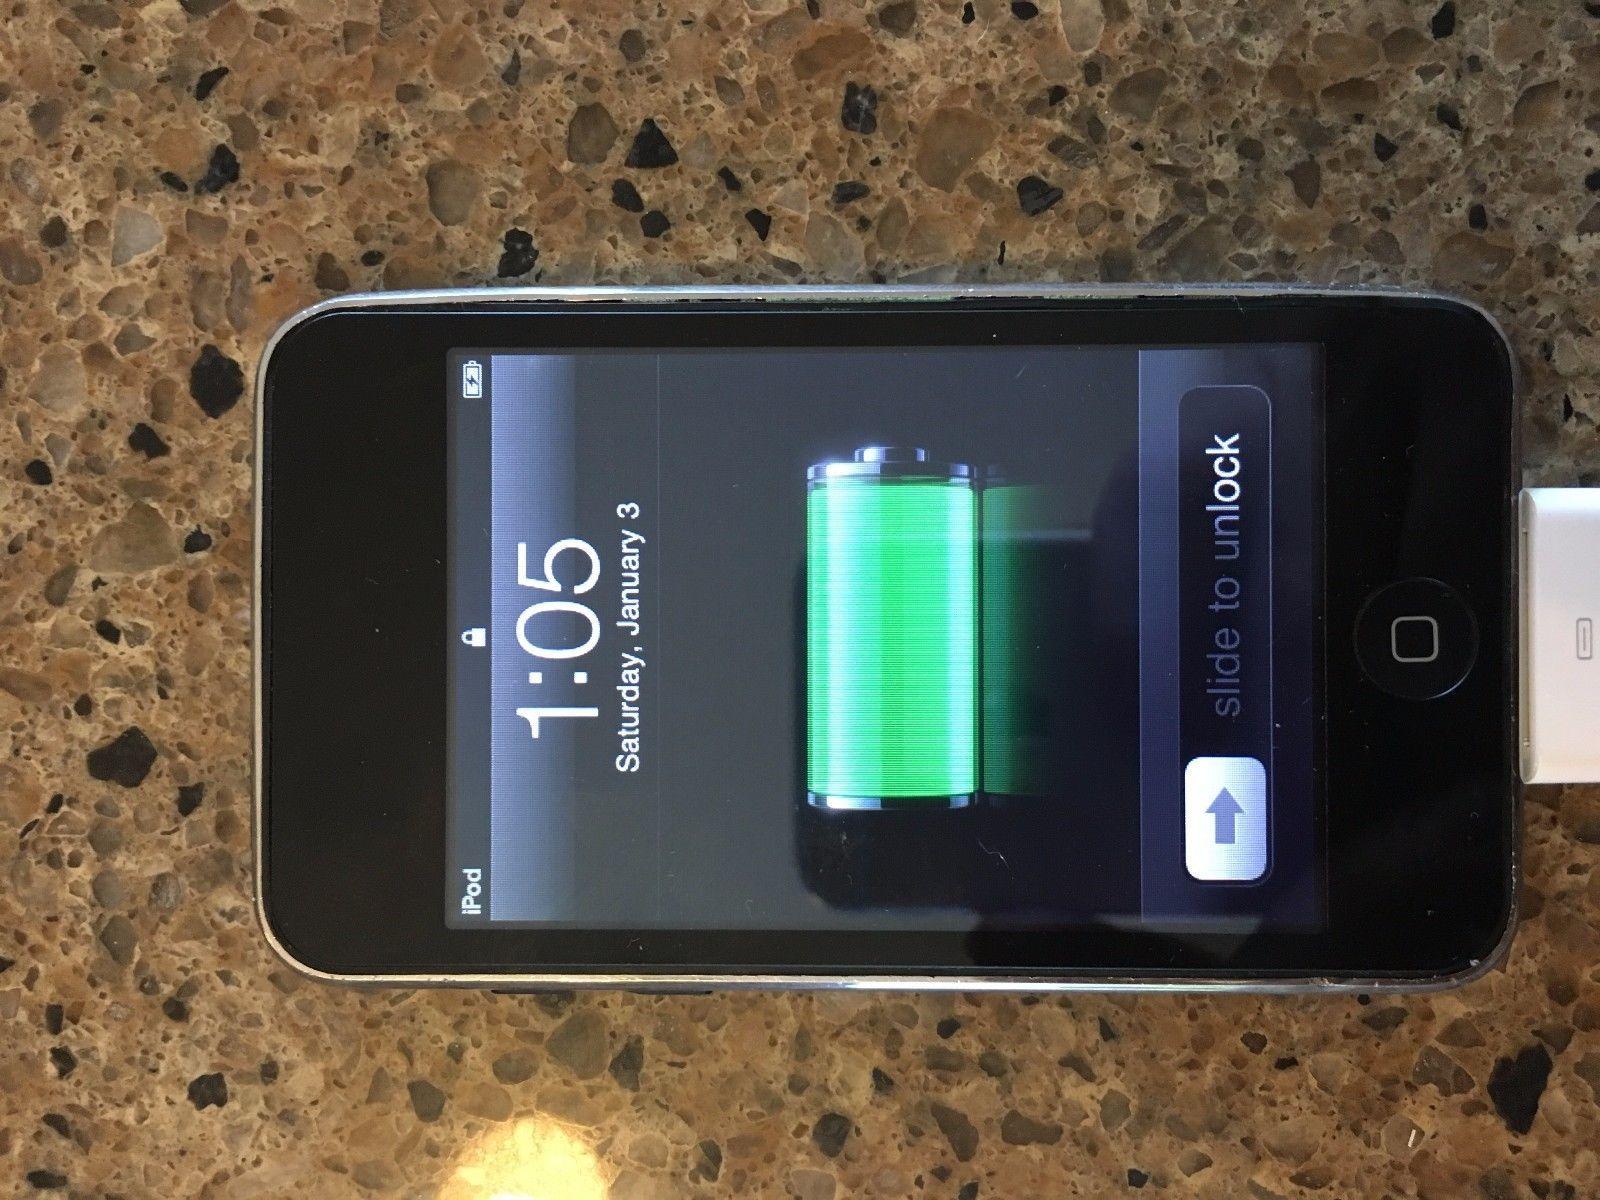 Apple iPod touch 2nd Generation Black (8GB) MB528LL A1288 https://t.co/mZ0VvdsXrz https://t.co/QoPVoZ3lil http://twitter.com/Foemvu_Maoxke/status/771286703768240128